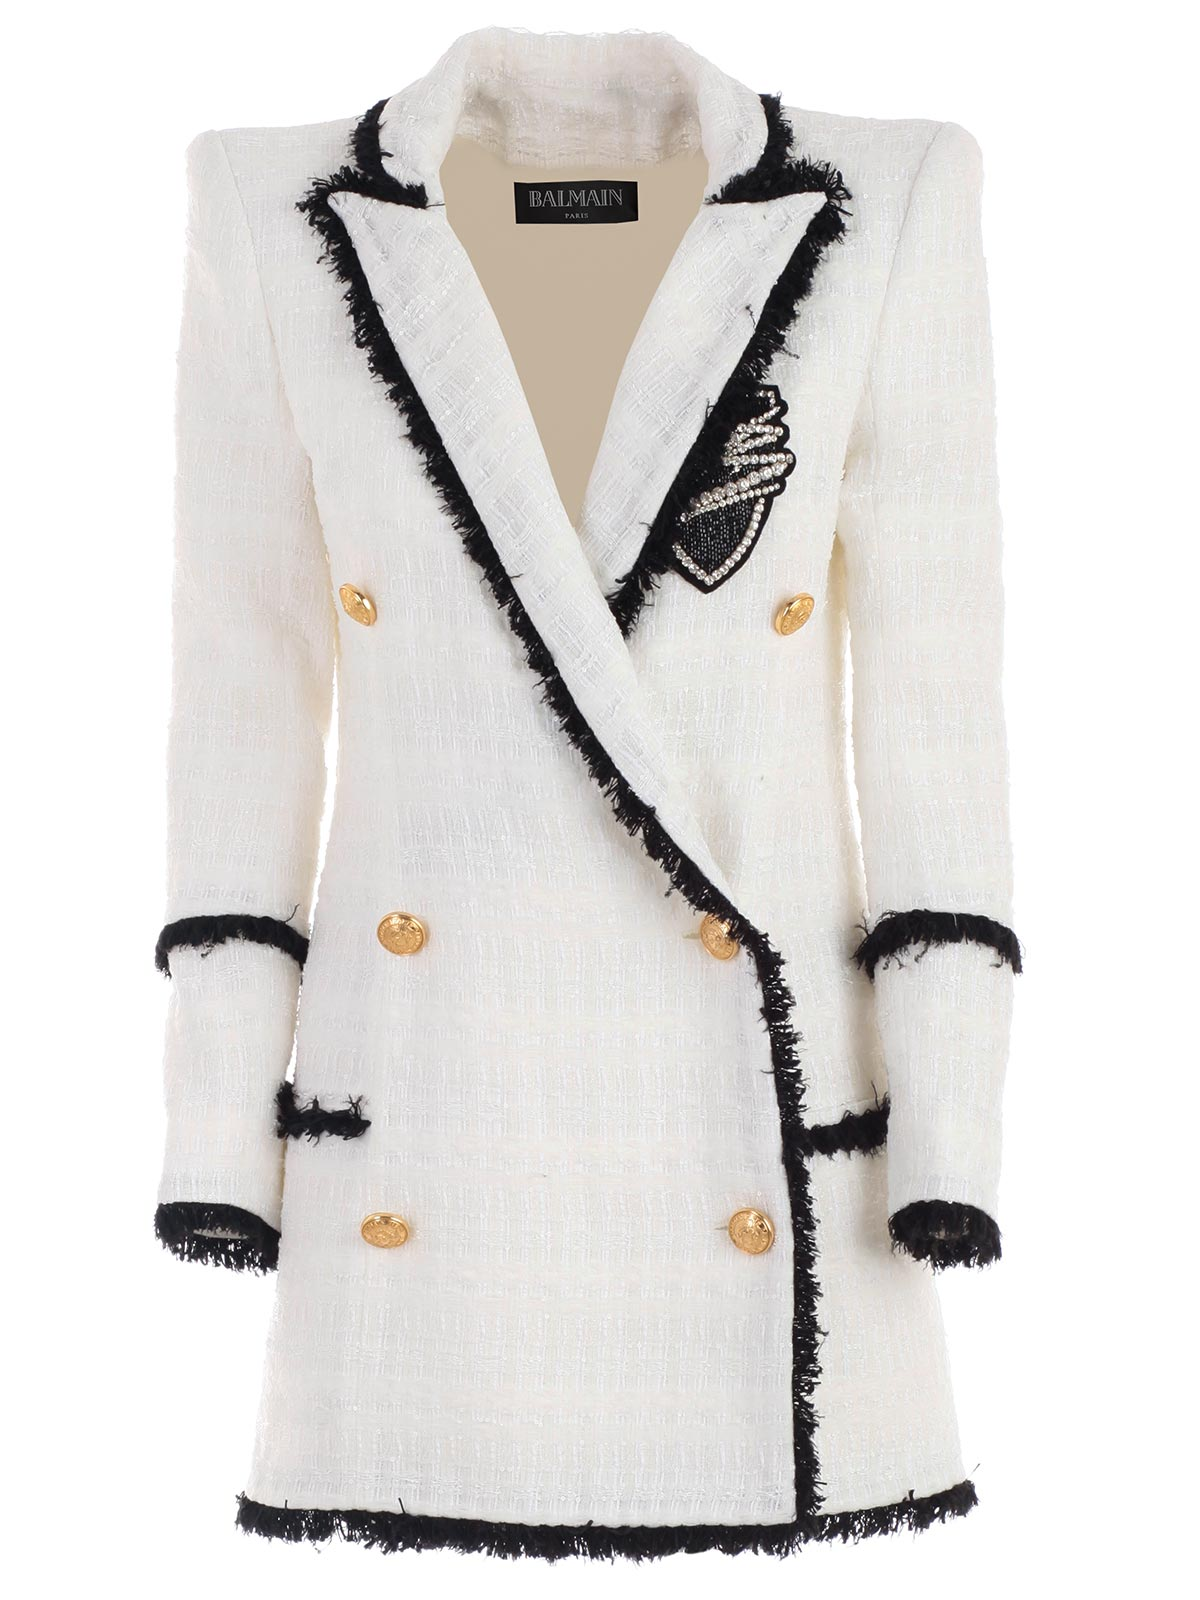 9c61dd6a58 Balmain Blazer RF17221X108 - GBA WHITE BLACK.Bernardelli Store ...